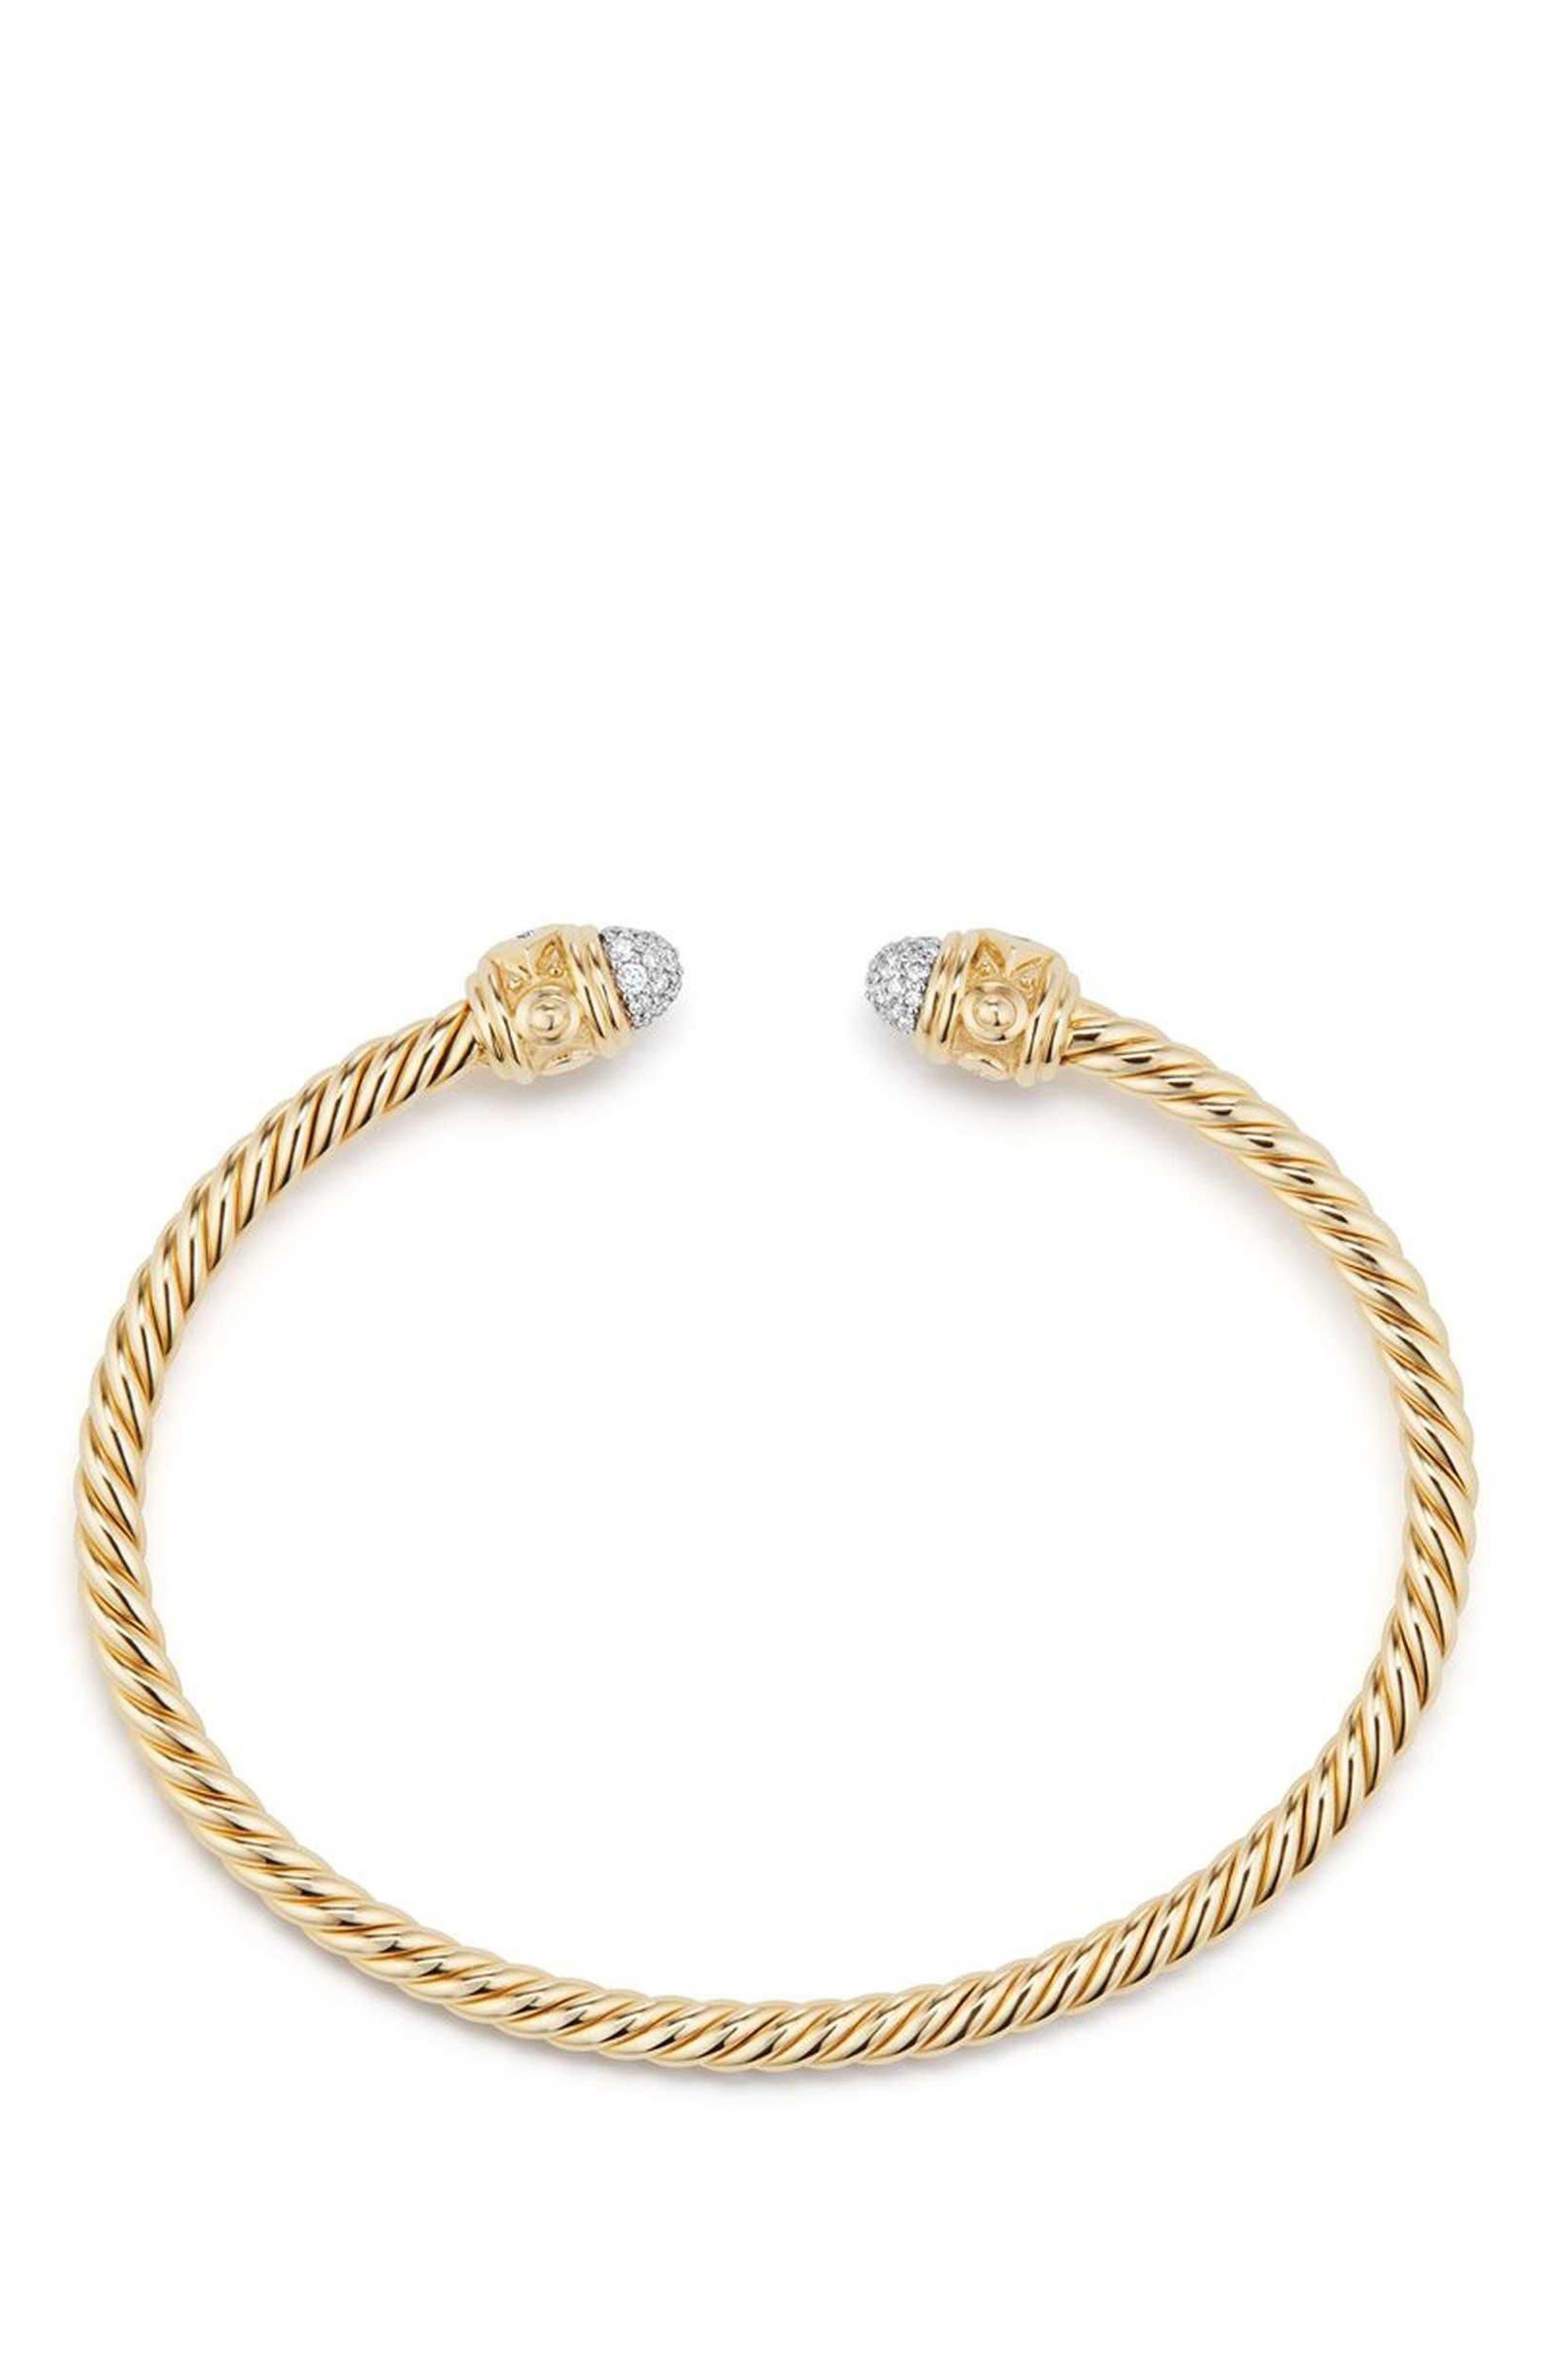 Renaissance 18k Gold Bracelet with Diamonds,                             Alternate thumbnail 2, color,                             GOLD/ DIAMOND